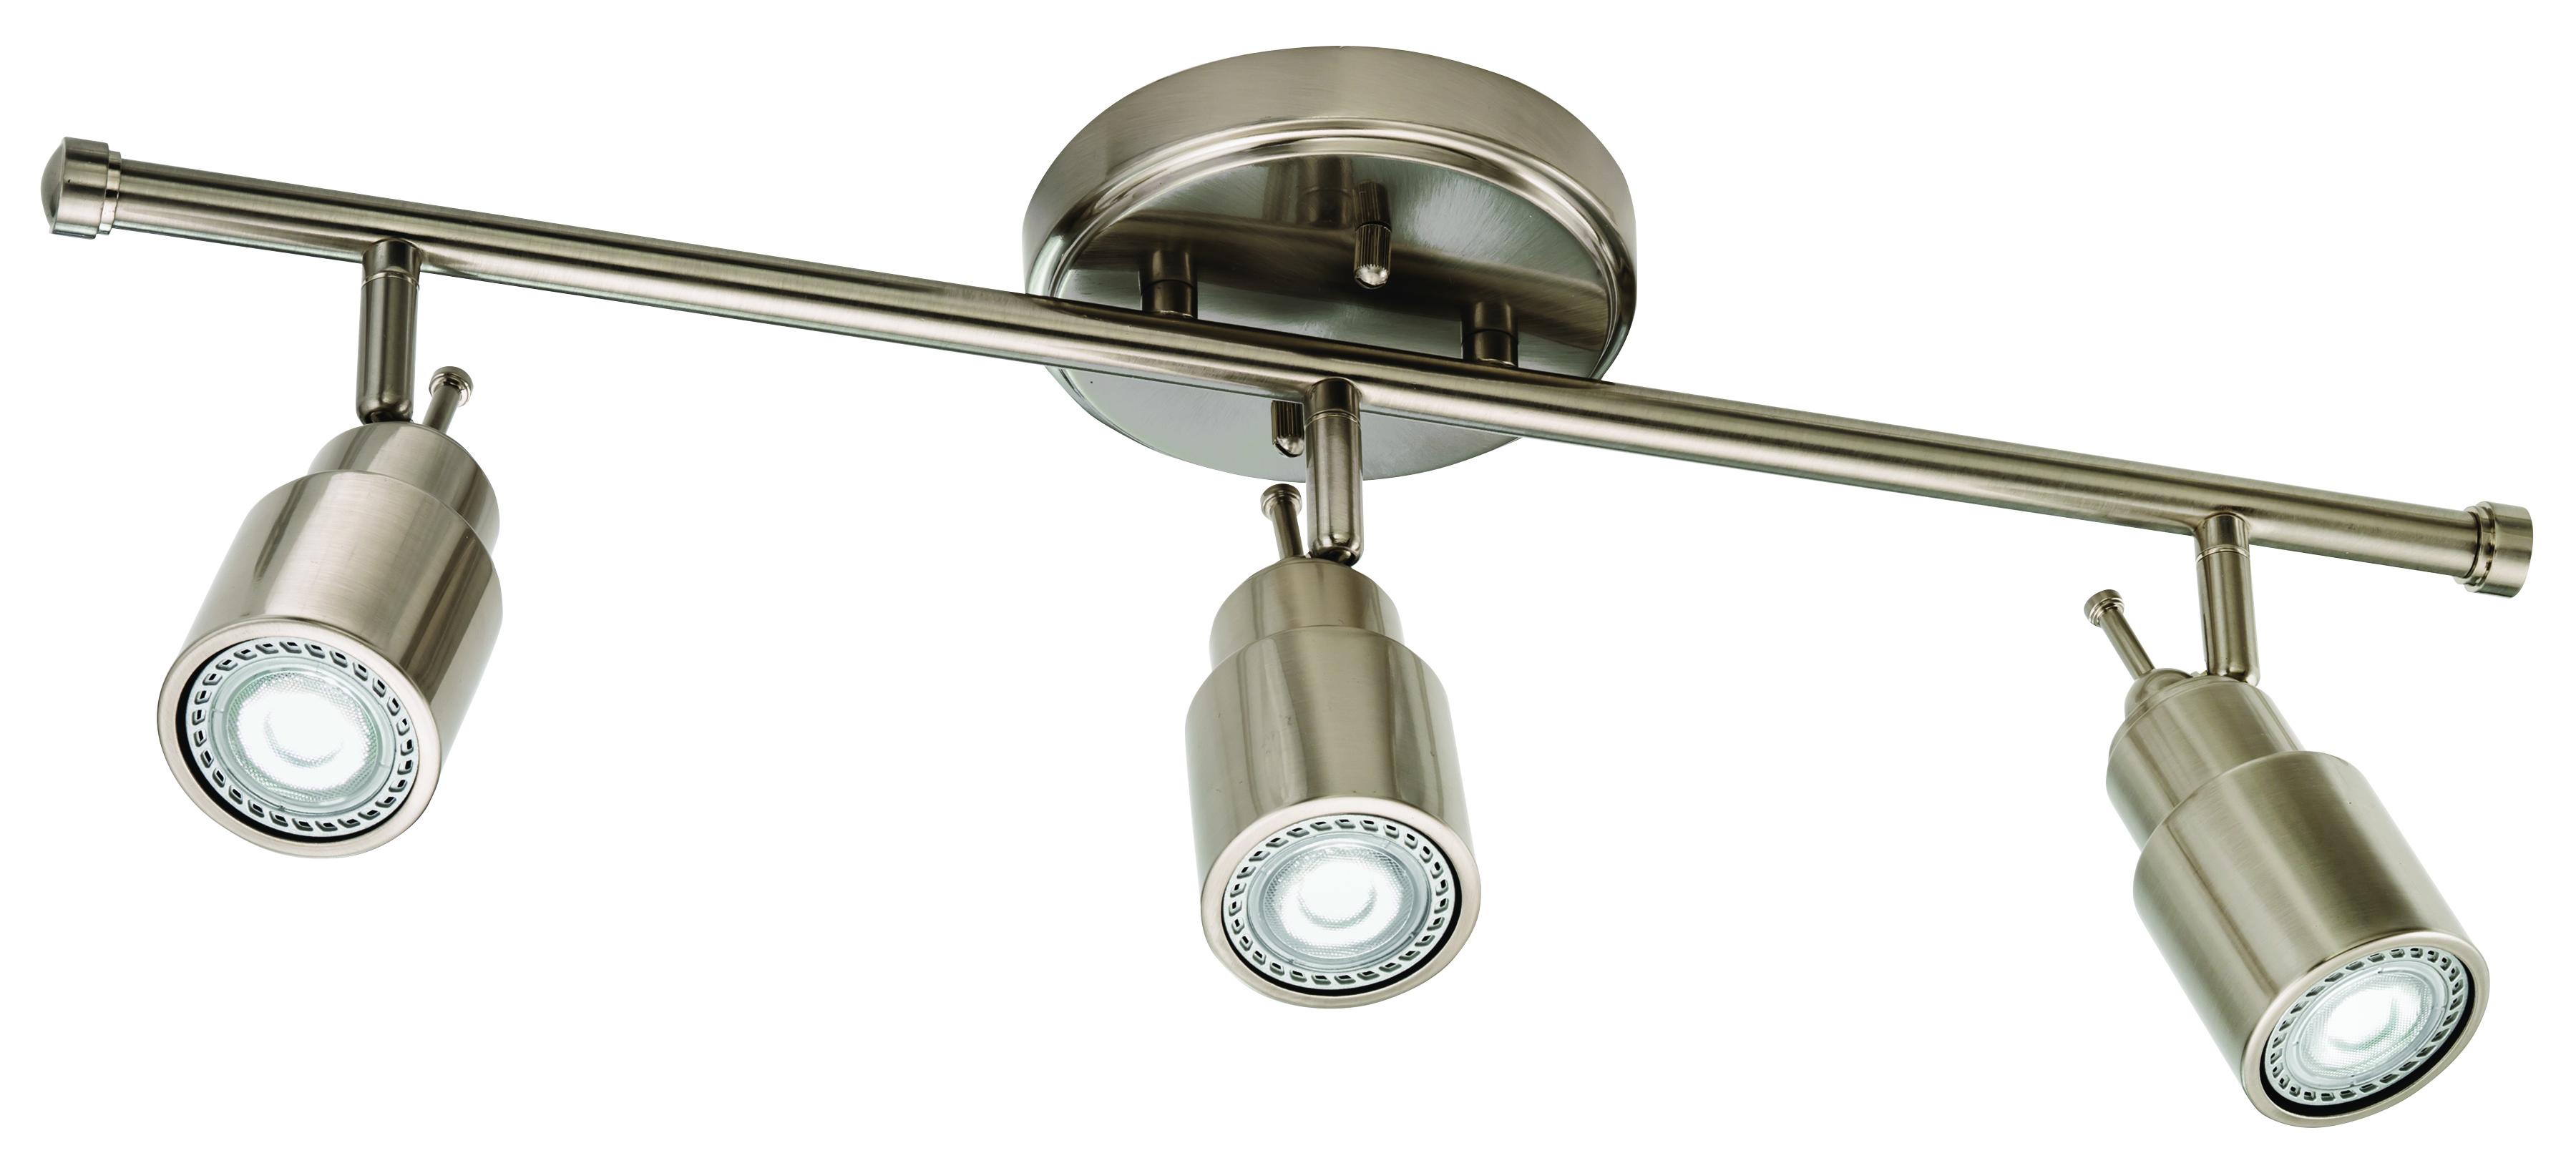 FixedLinearStepCylinderSeries_3 Lamp BN for application option 4